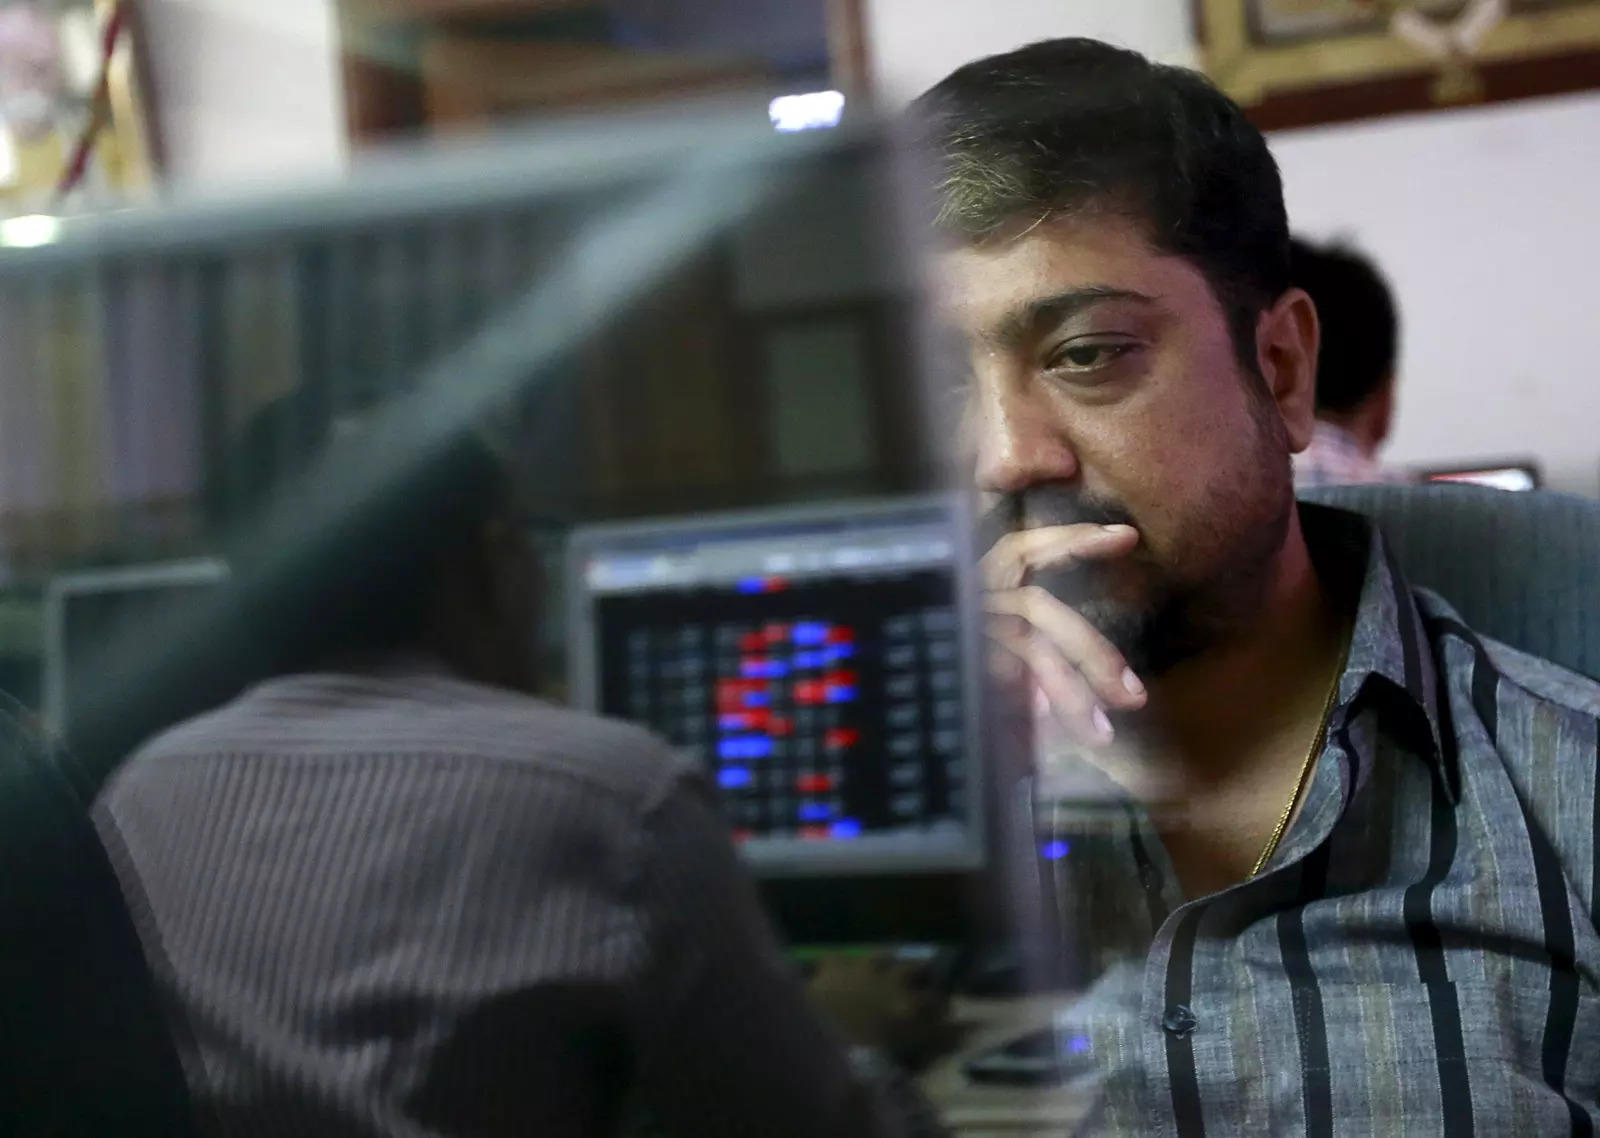 Stocks in the news: HDFC AMC, Bharti Airtel, Max Healthcare, Lupin and IndiGo